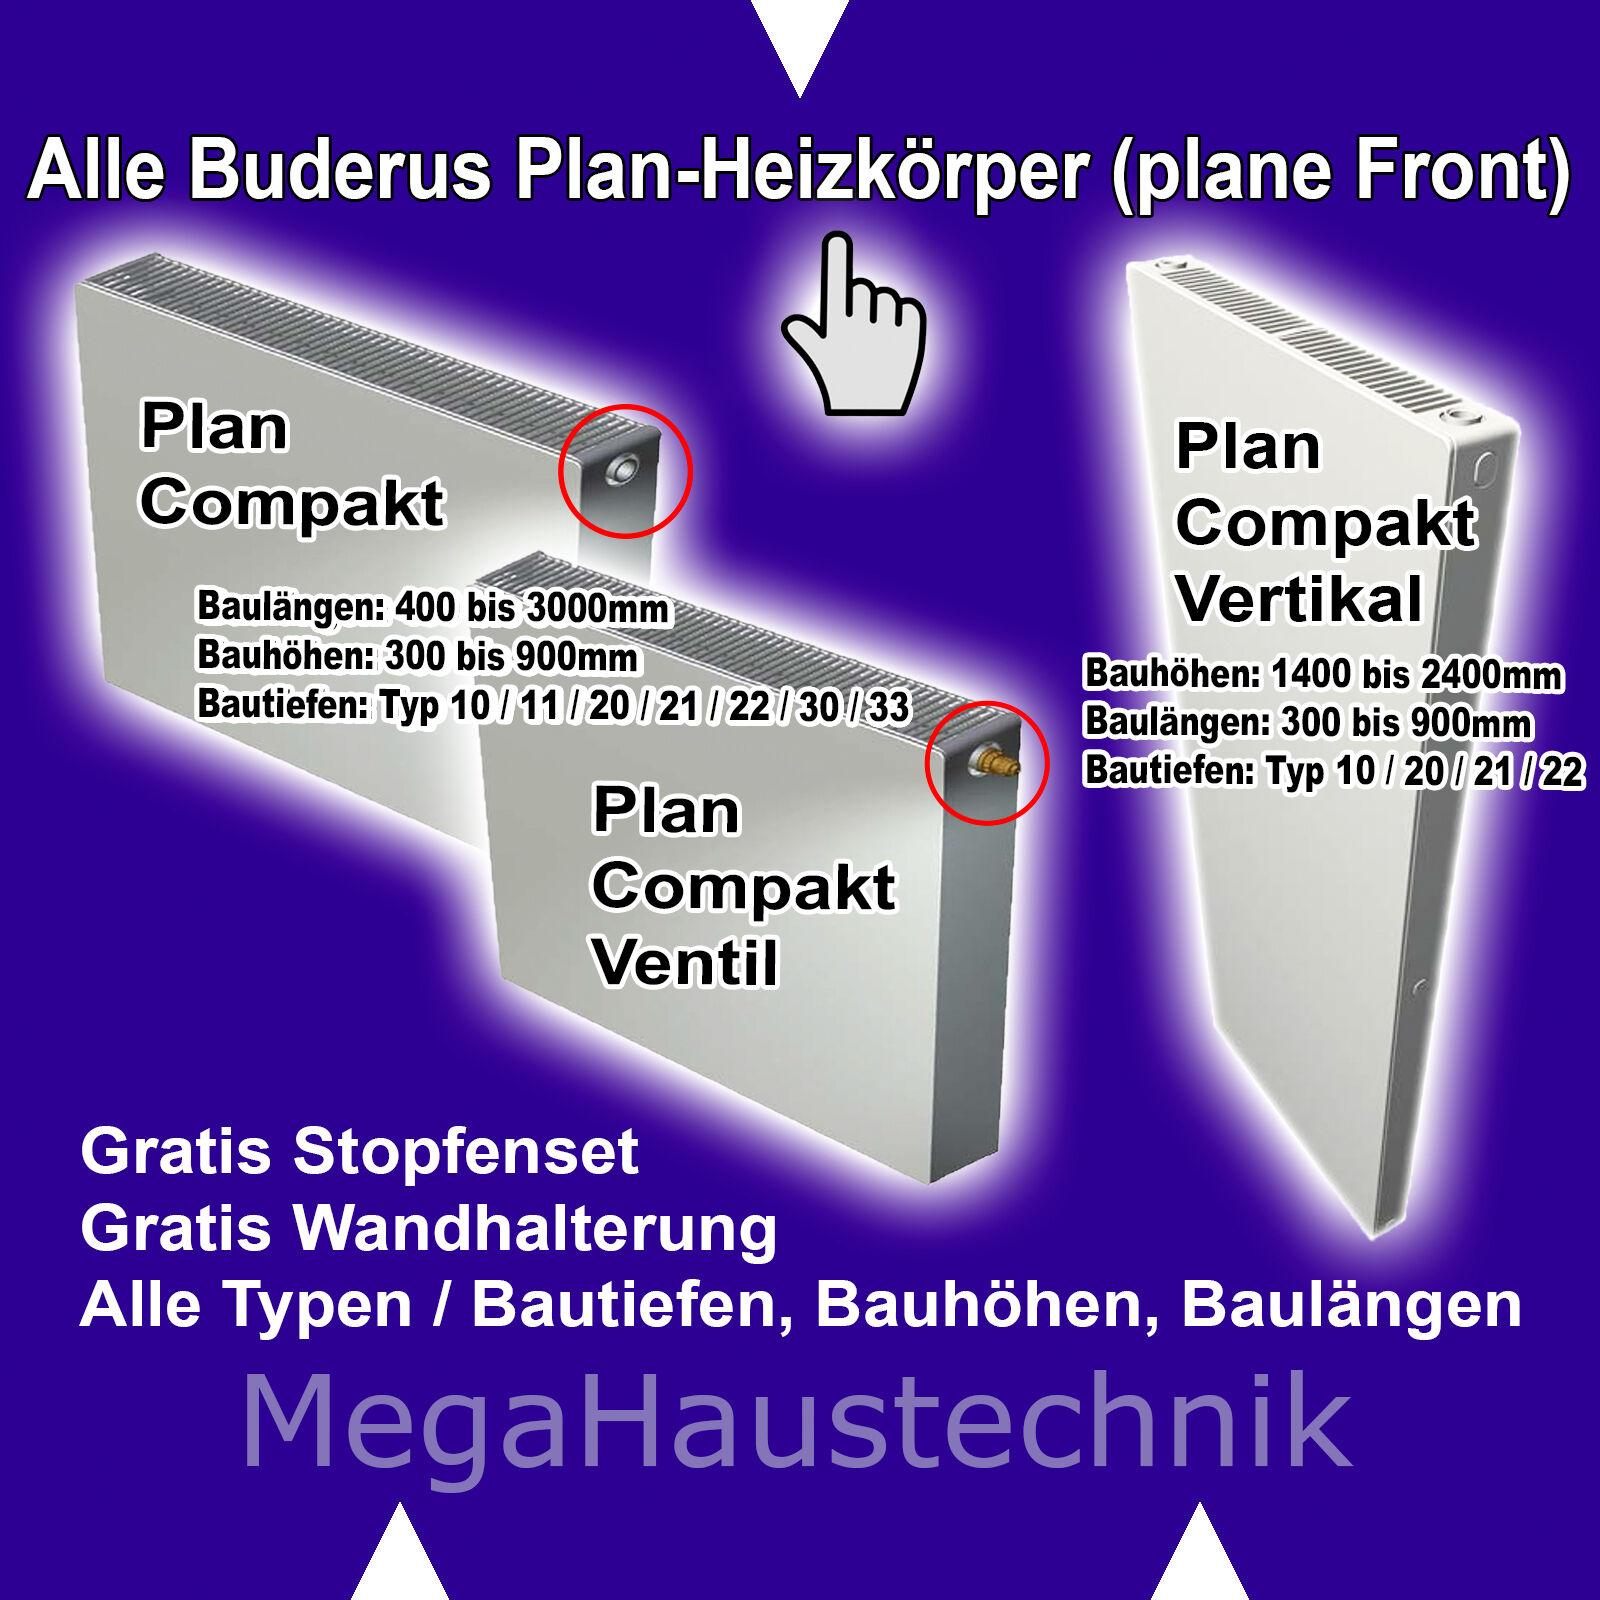 2018 NEU: NEU: NEU: ALLE BUDERUS HEIZKÖRPER + ALLE SOFORT lieferbaren COMPAKT PROFILIERTE 006f8a